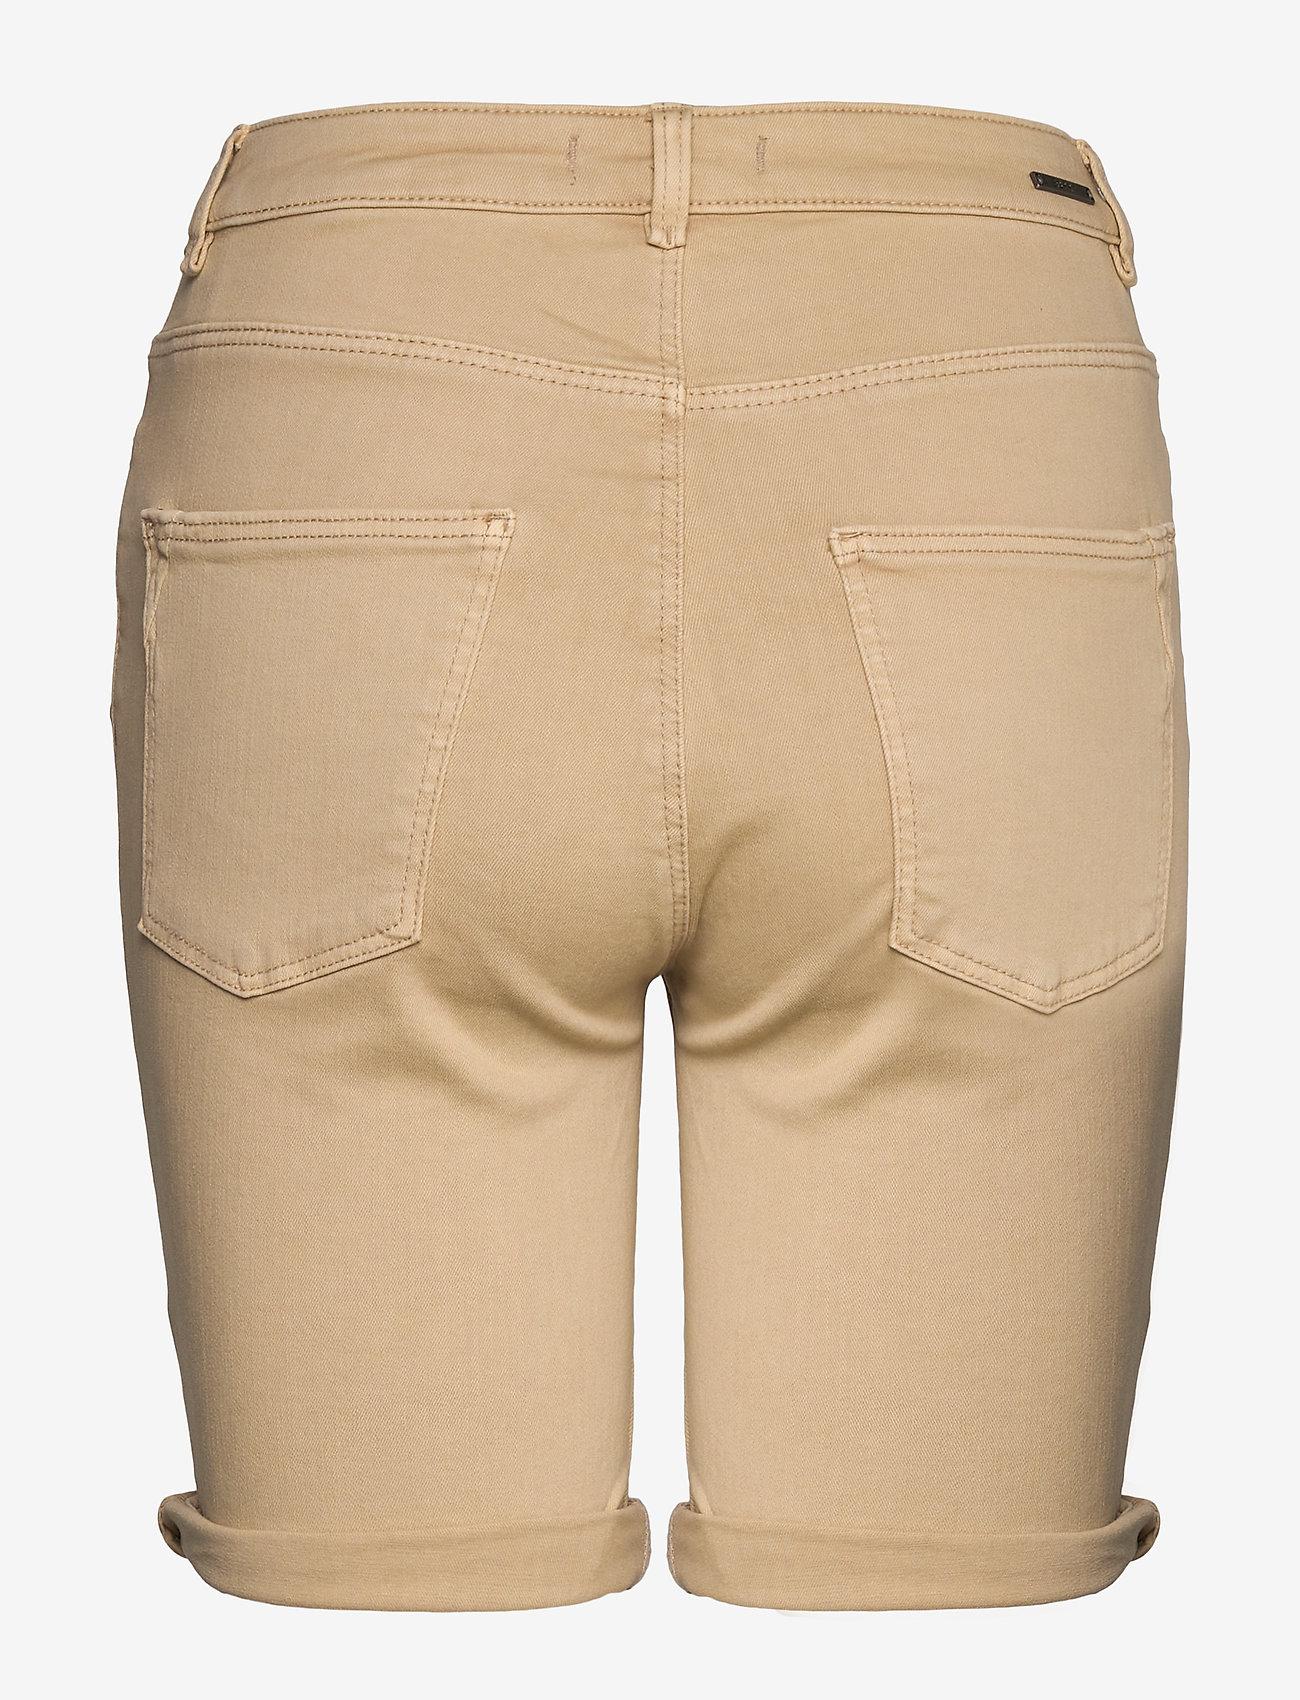 Shorts Woven (Skin Beige) (349.99 kr) - Esprit Casual